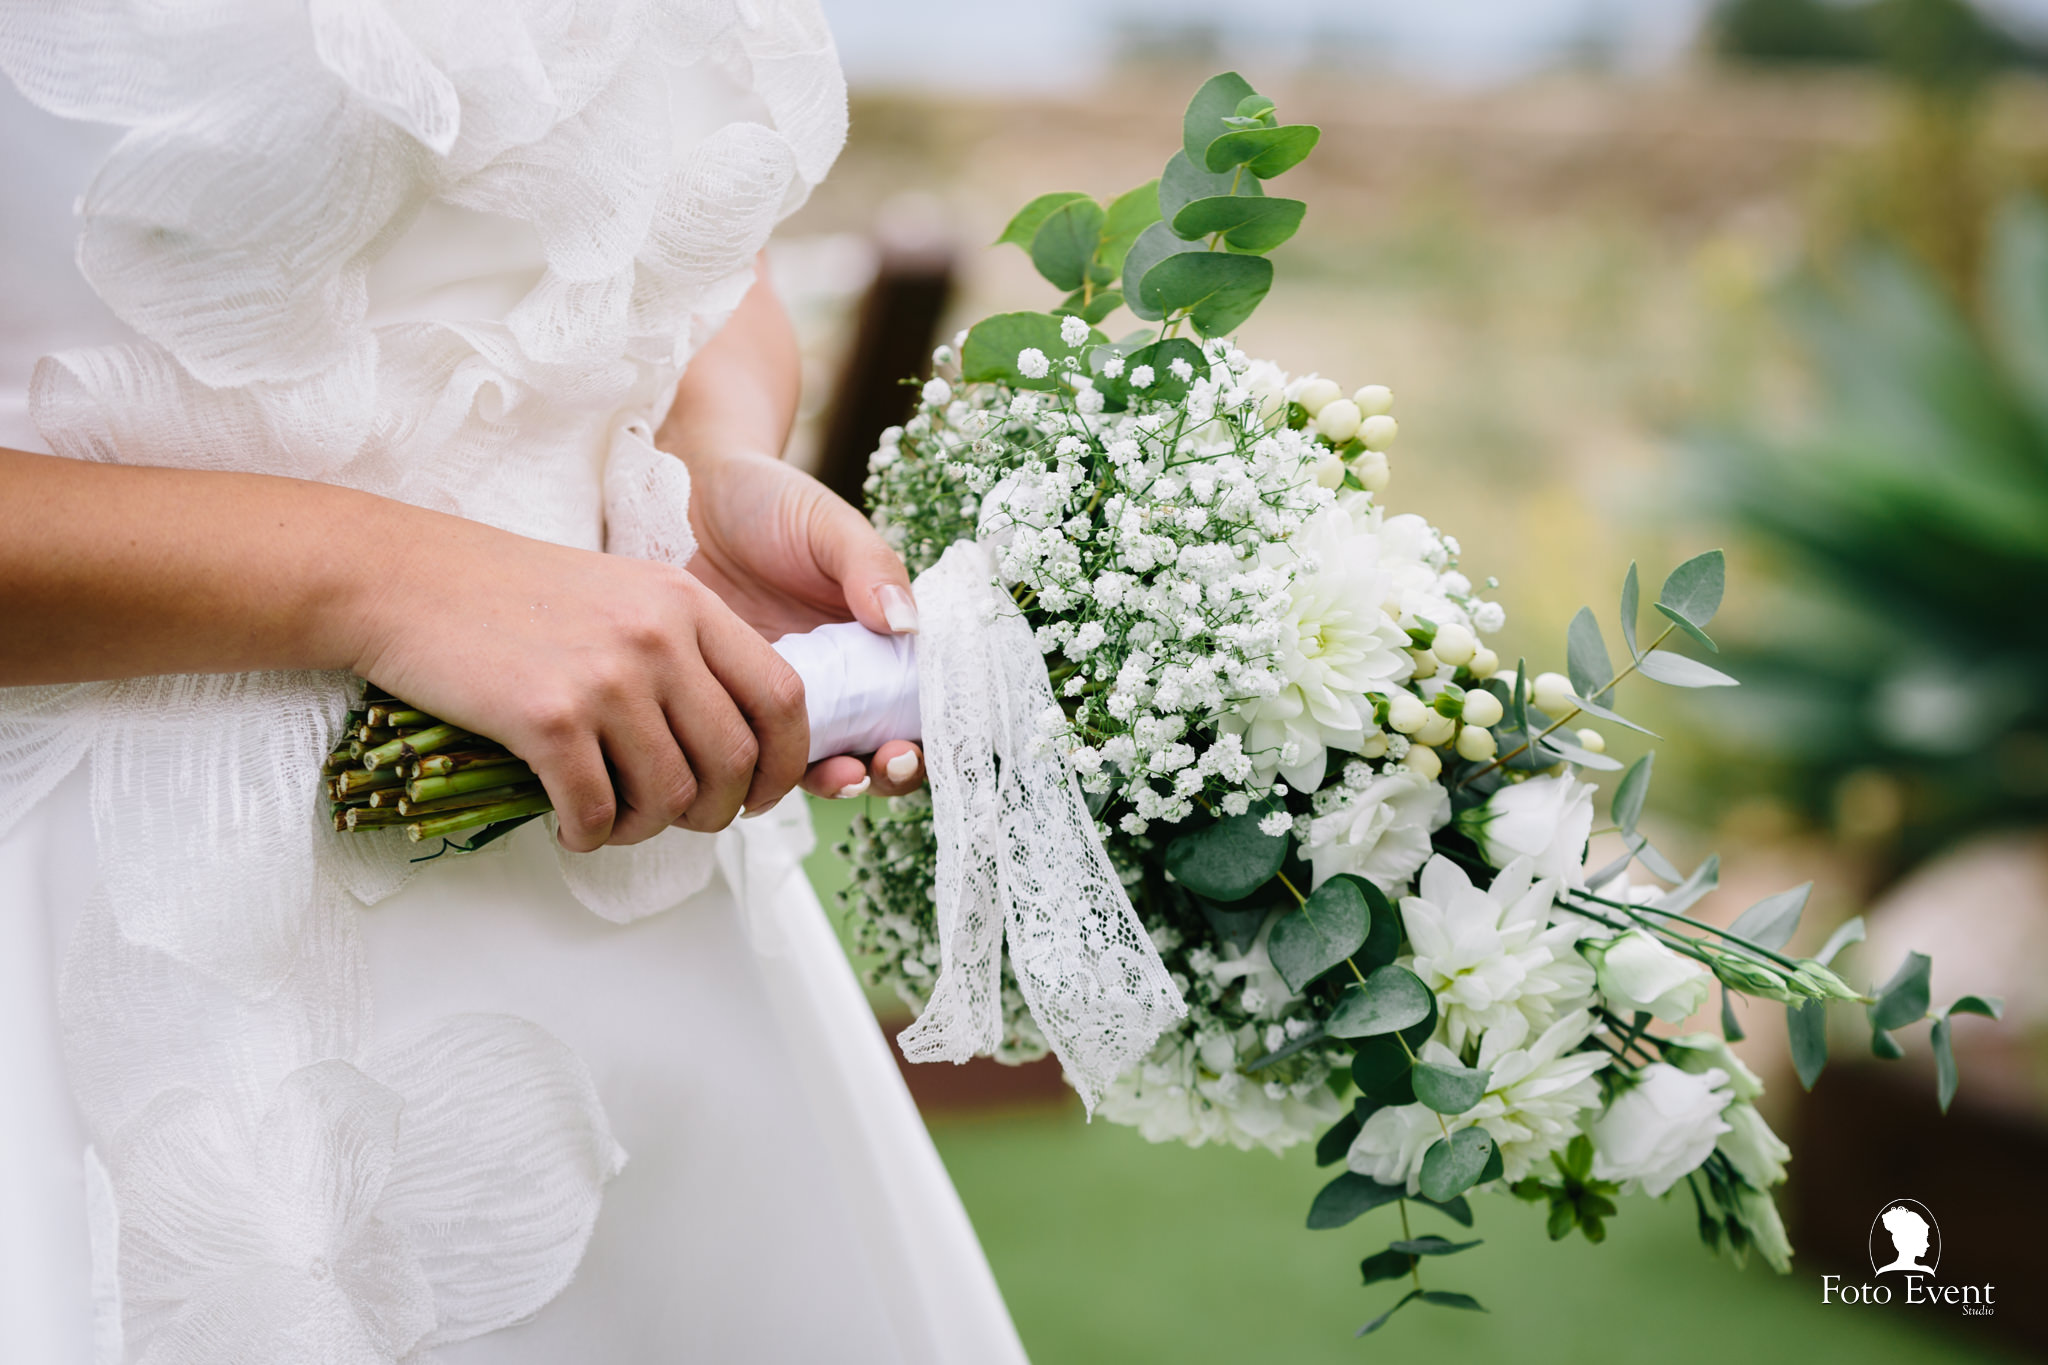 022-2020-10-15-Matrimonio-Noemi-e-Salvatore-Paterno-zoom-256